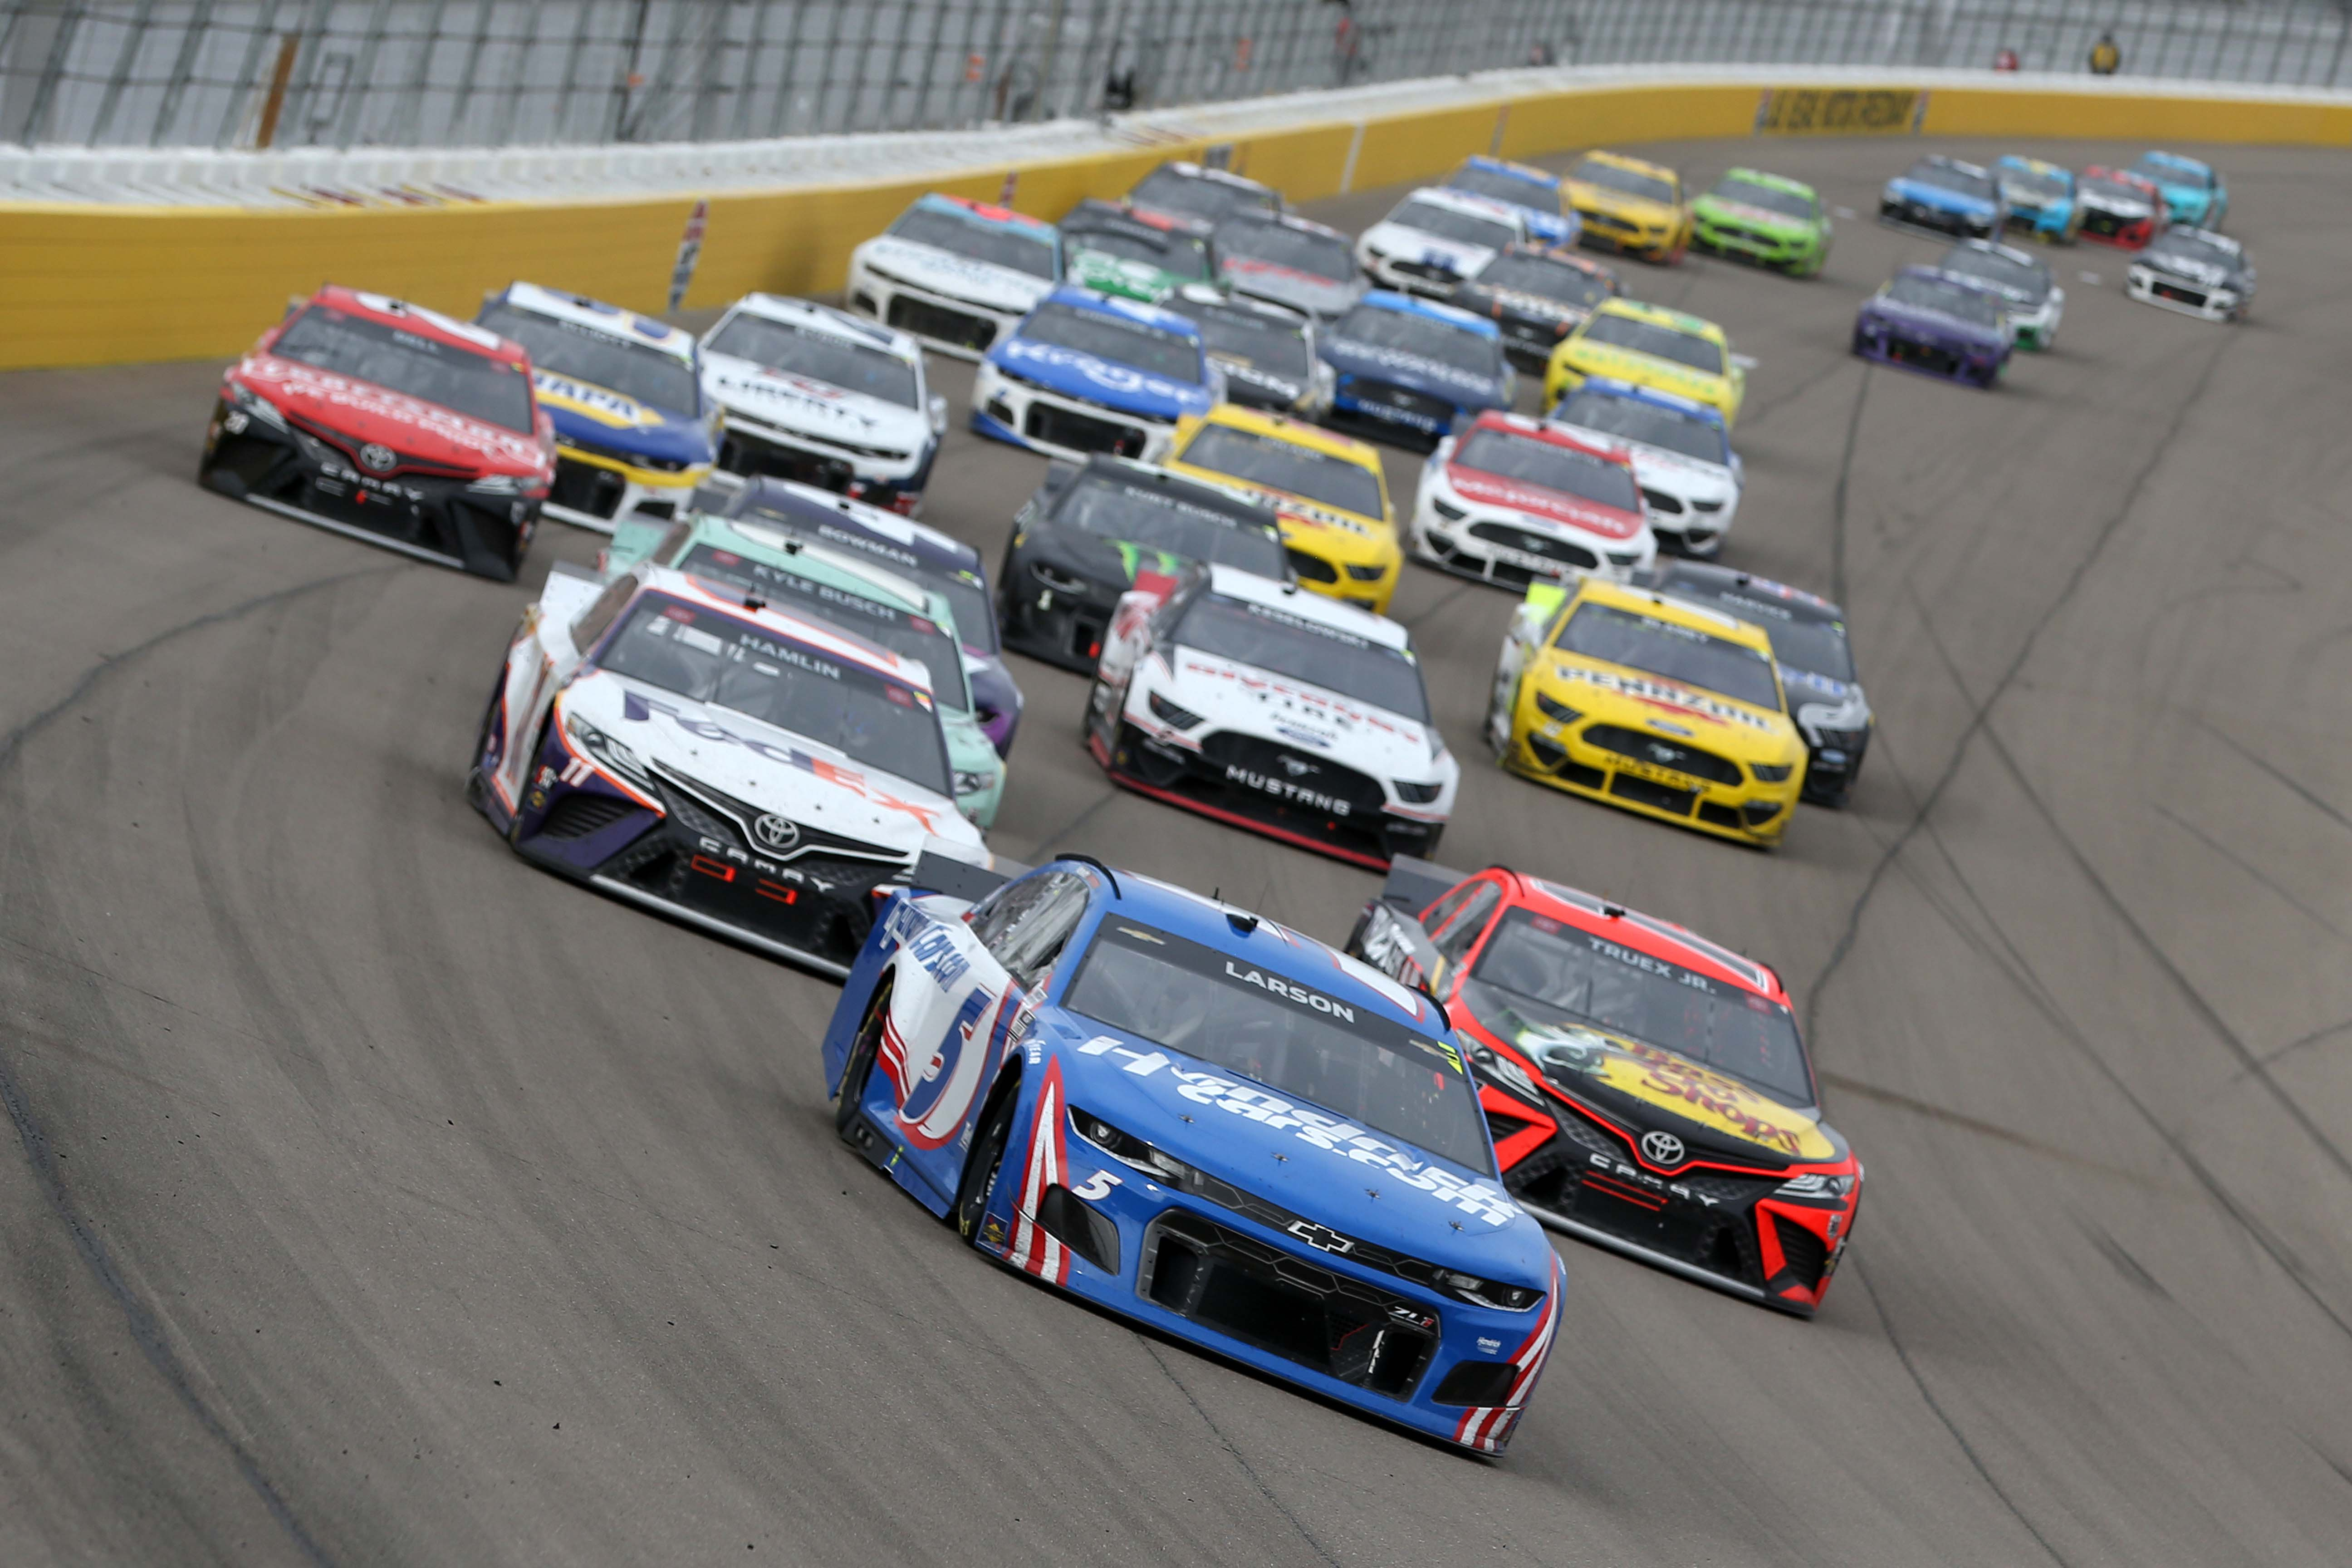 Kyle Larson leads Denny Hamlin and Martin Truex Jr - Las Vegas Motor Speedway - NASCAR Cup Series